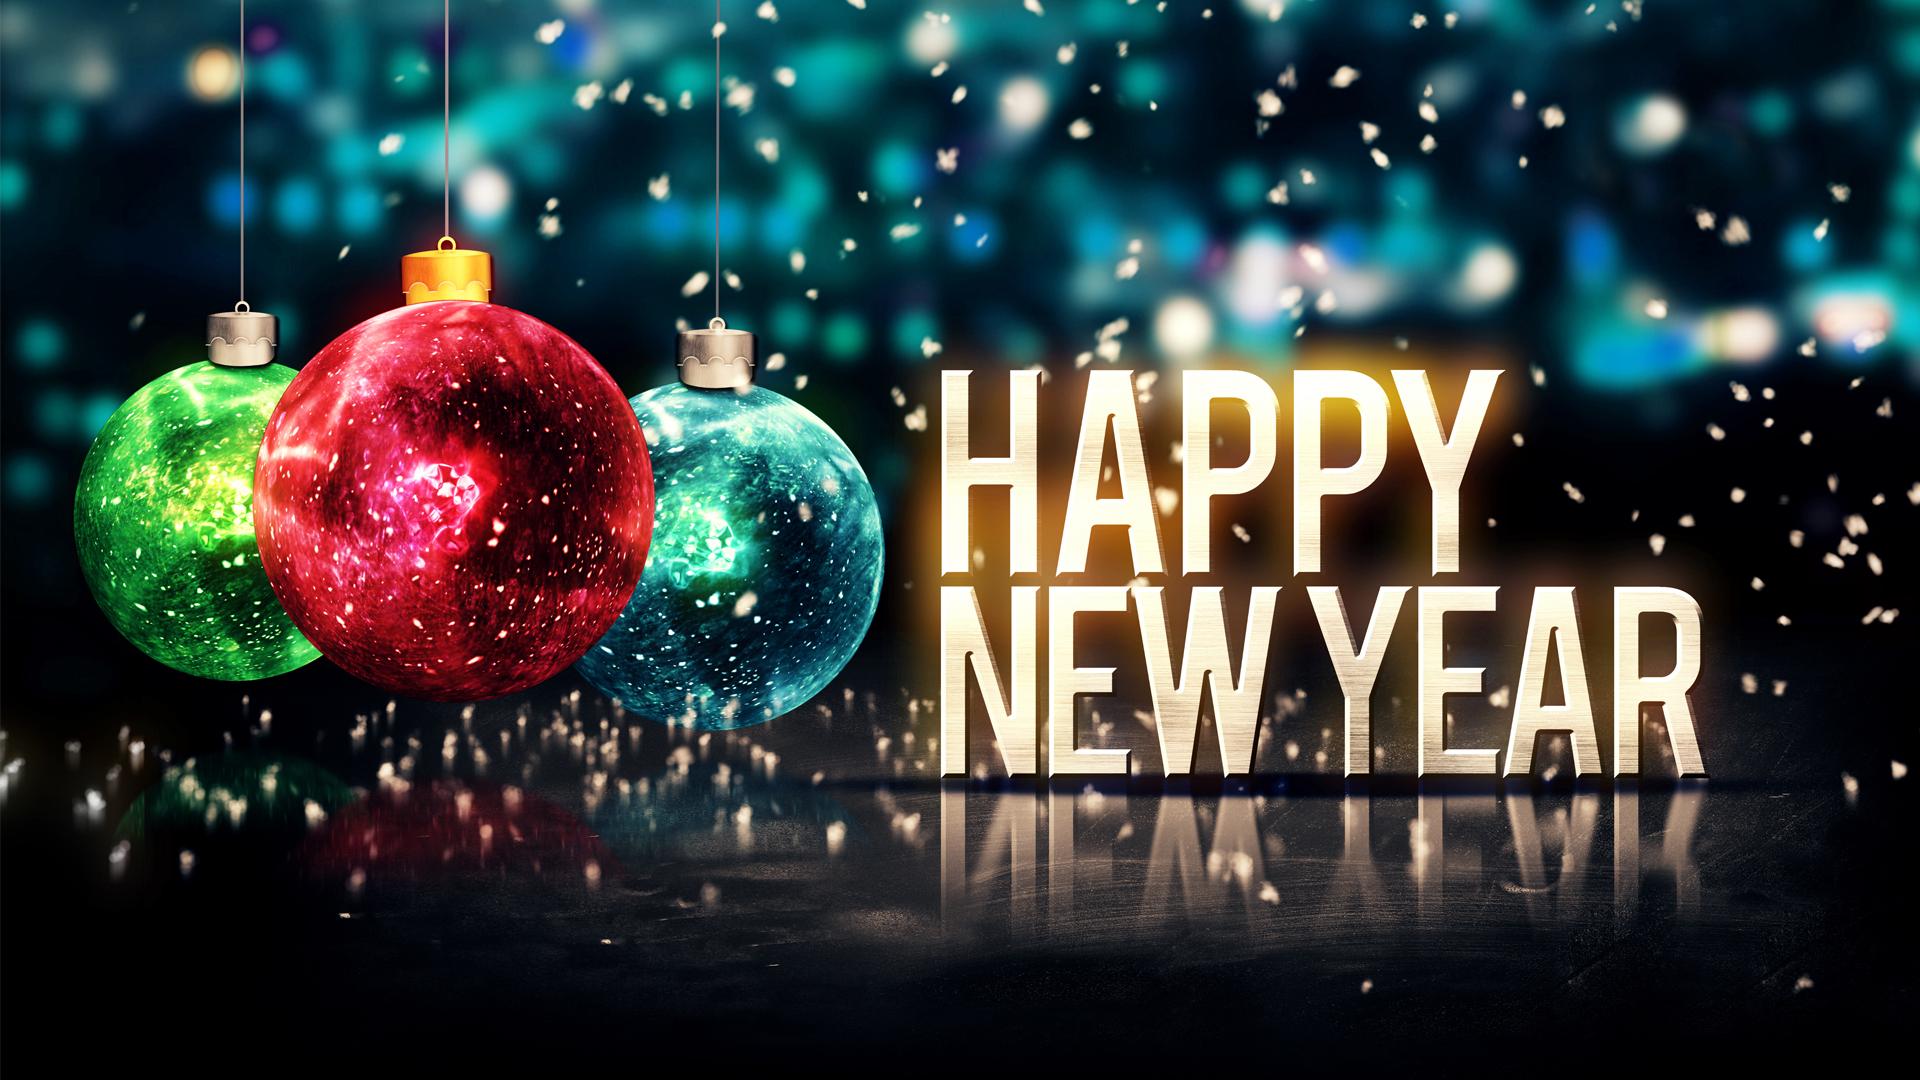 Happy New Year 2016 Best Hd Wallpapers Volganga